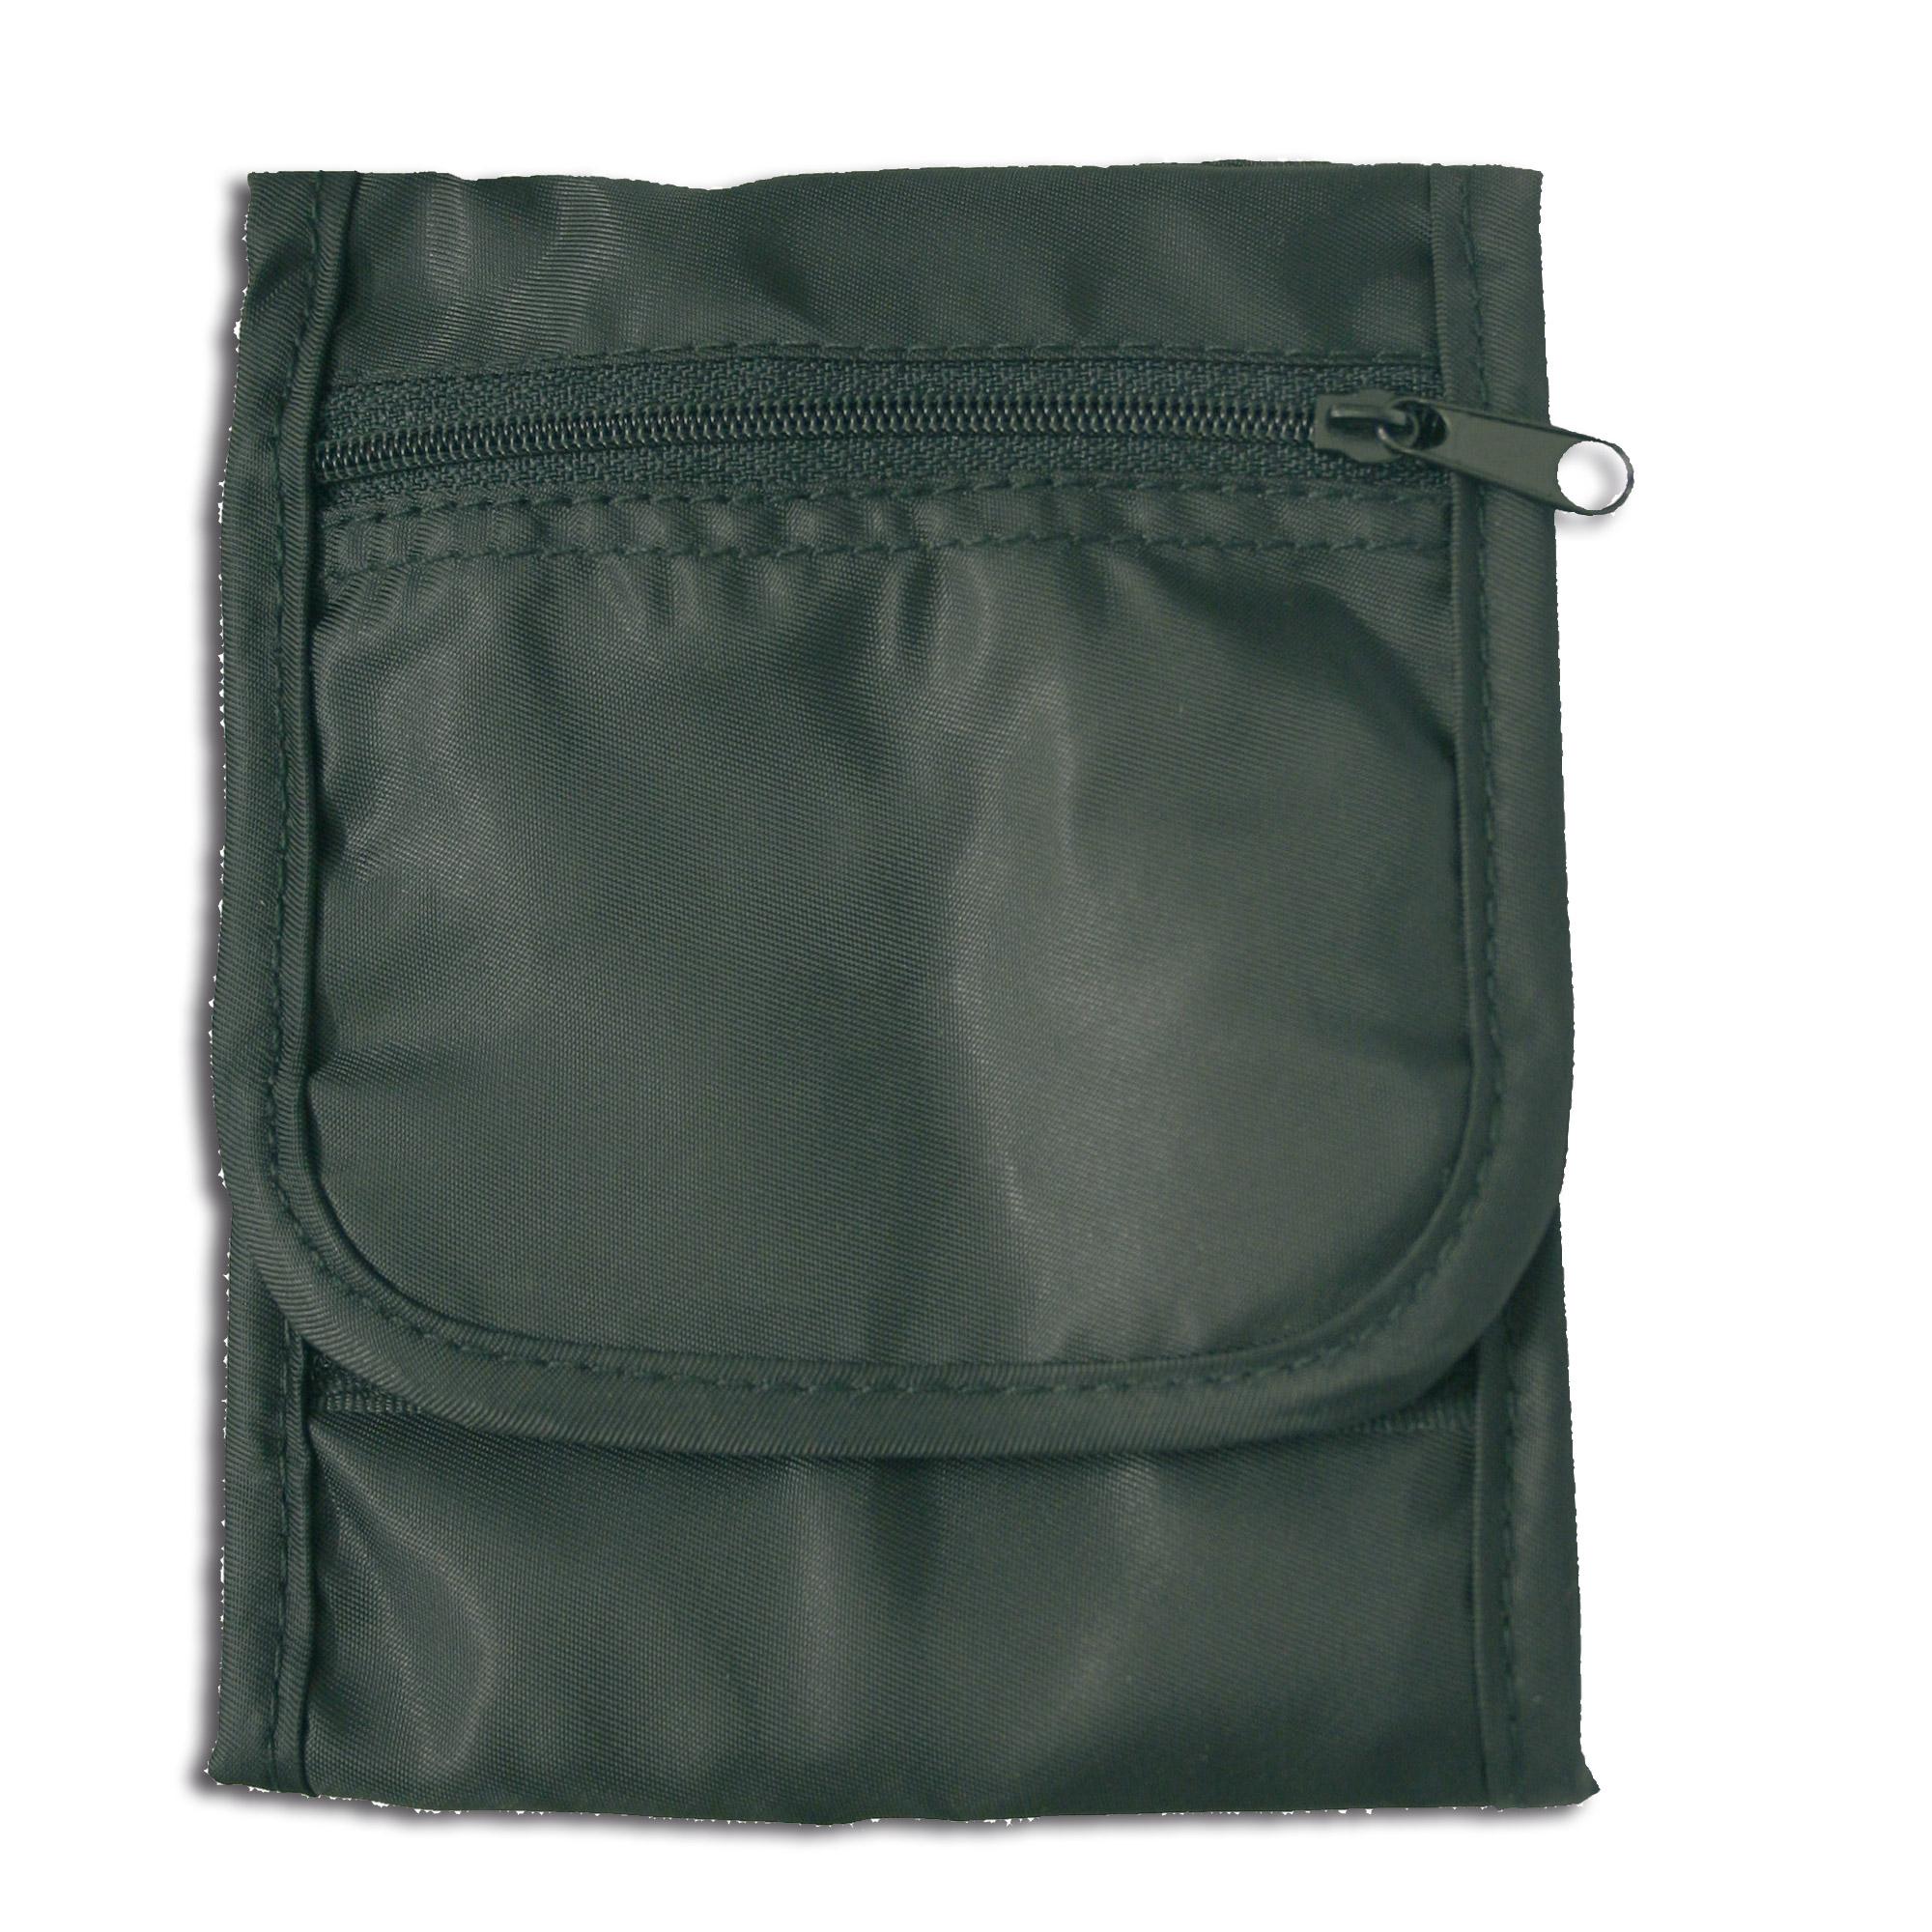 Zipper Neck Pouch black